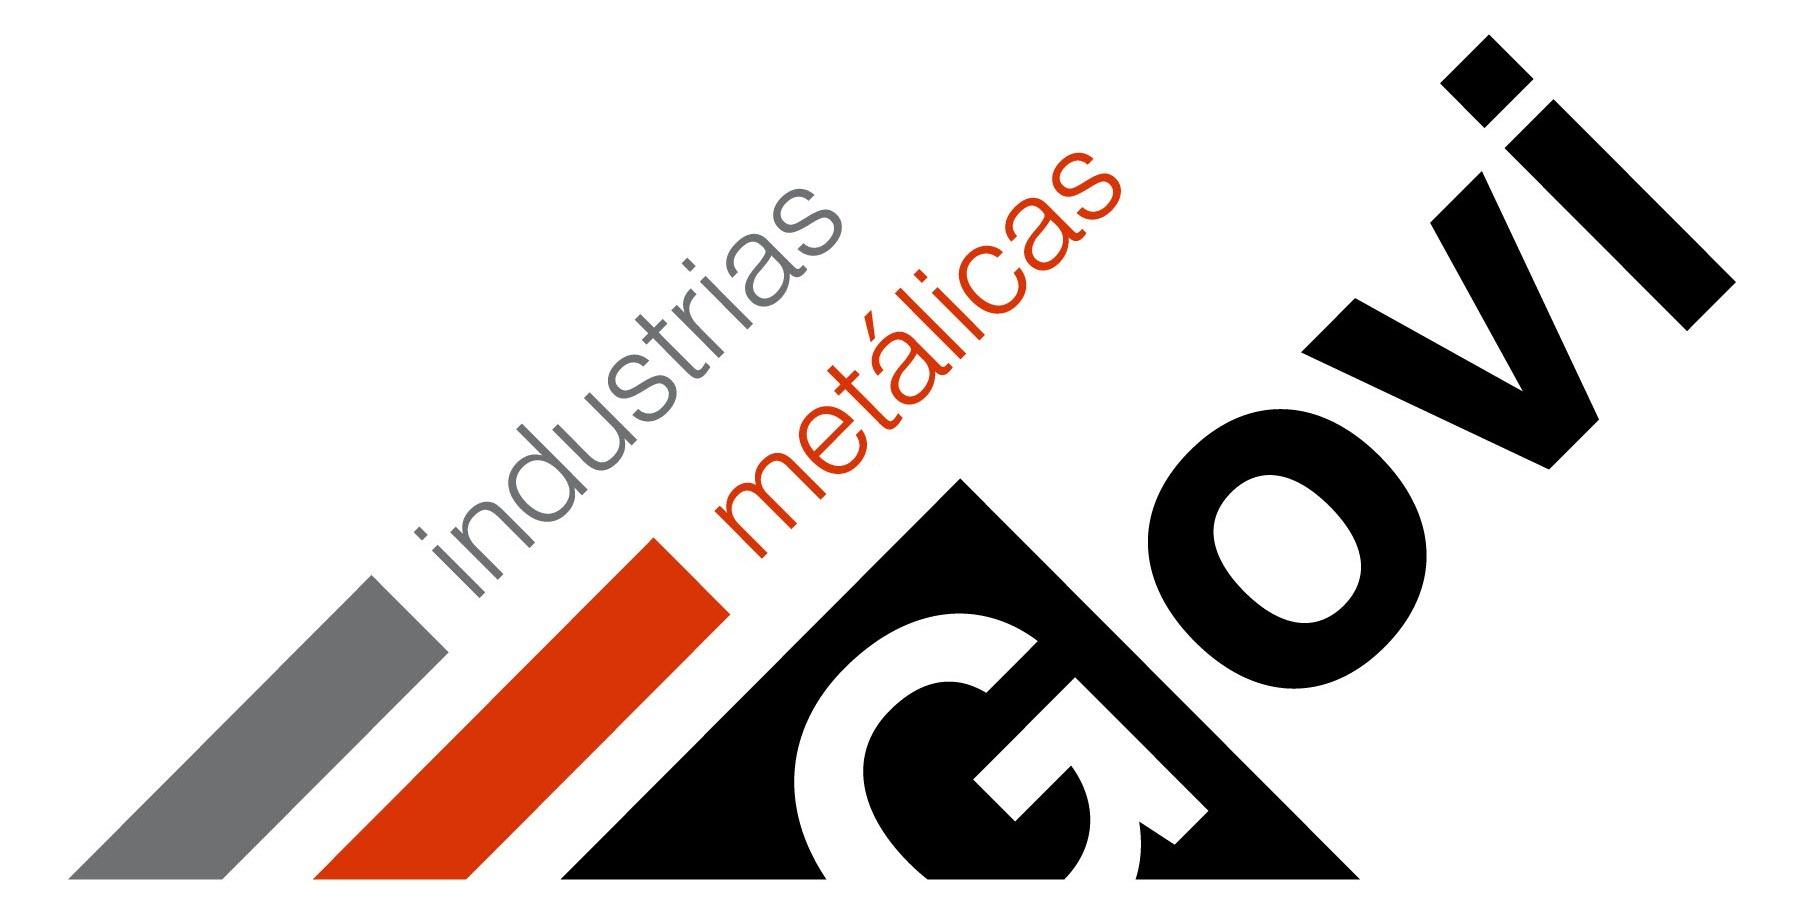 Industrias Metálicas Govi